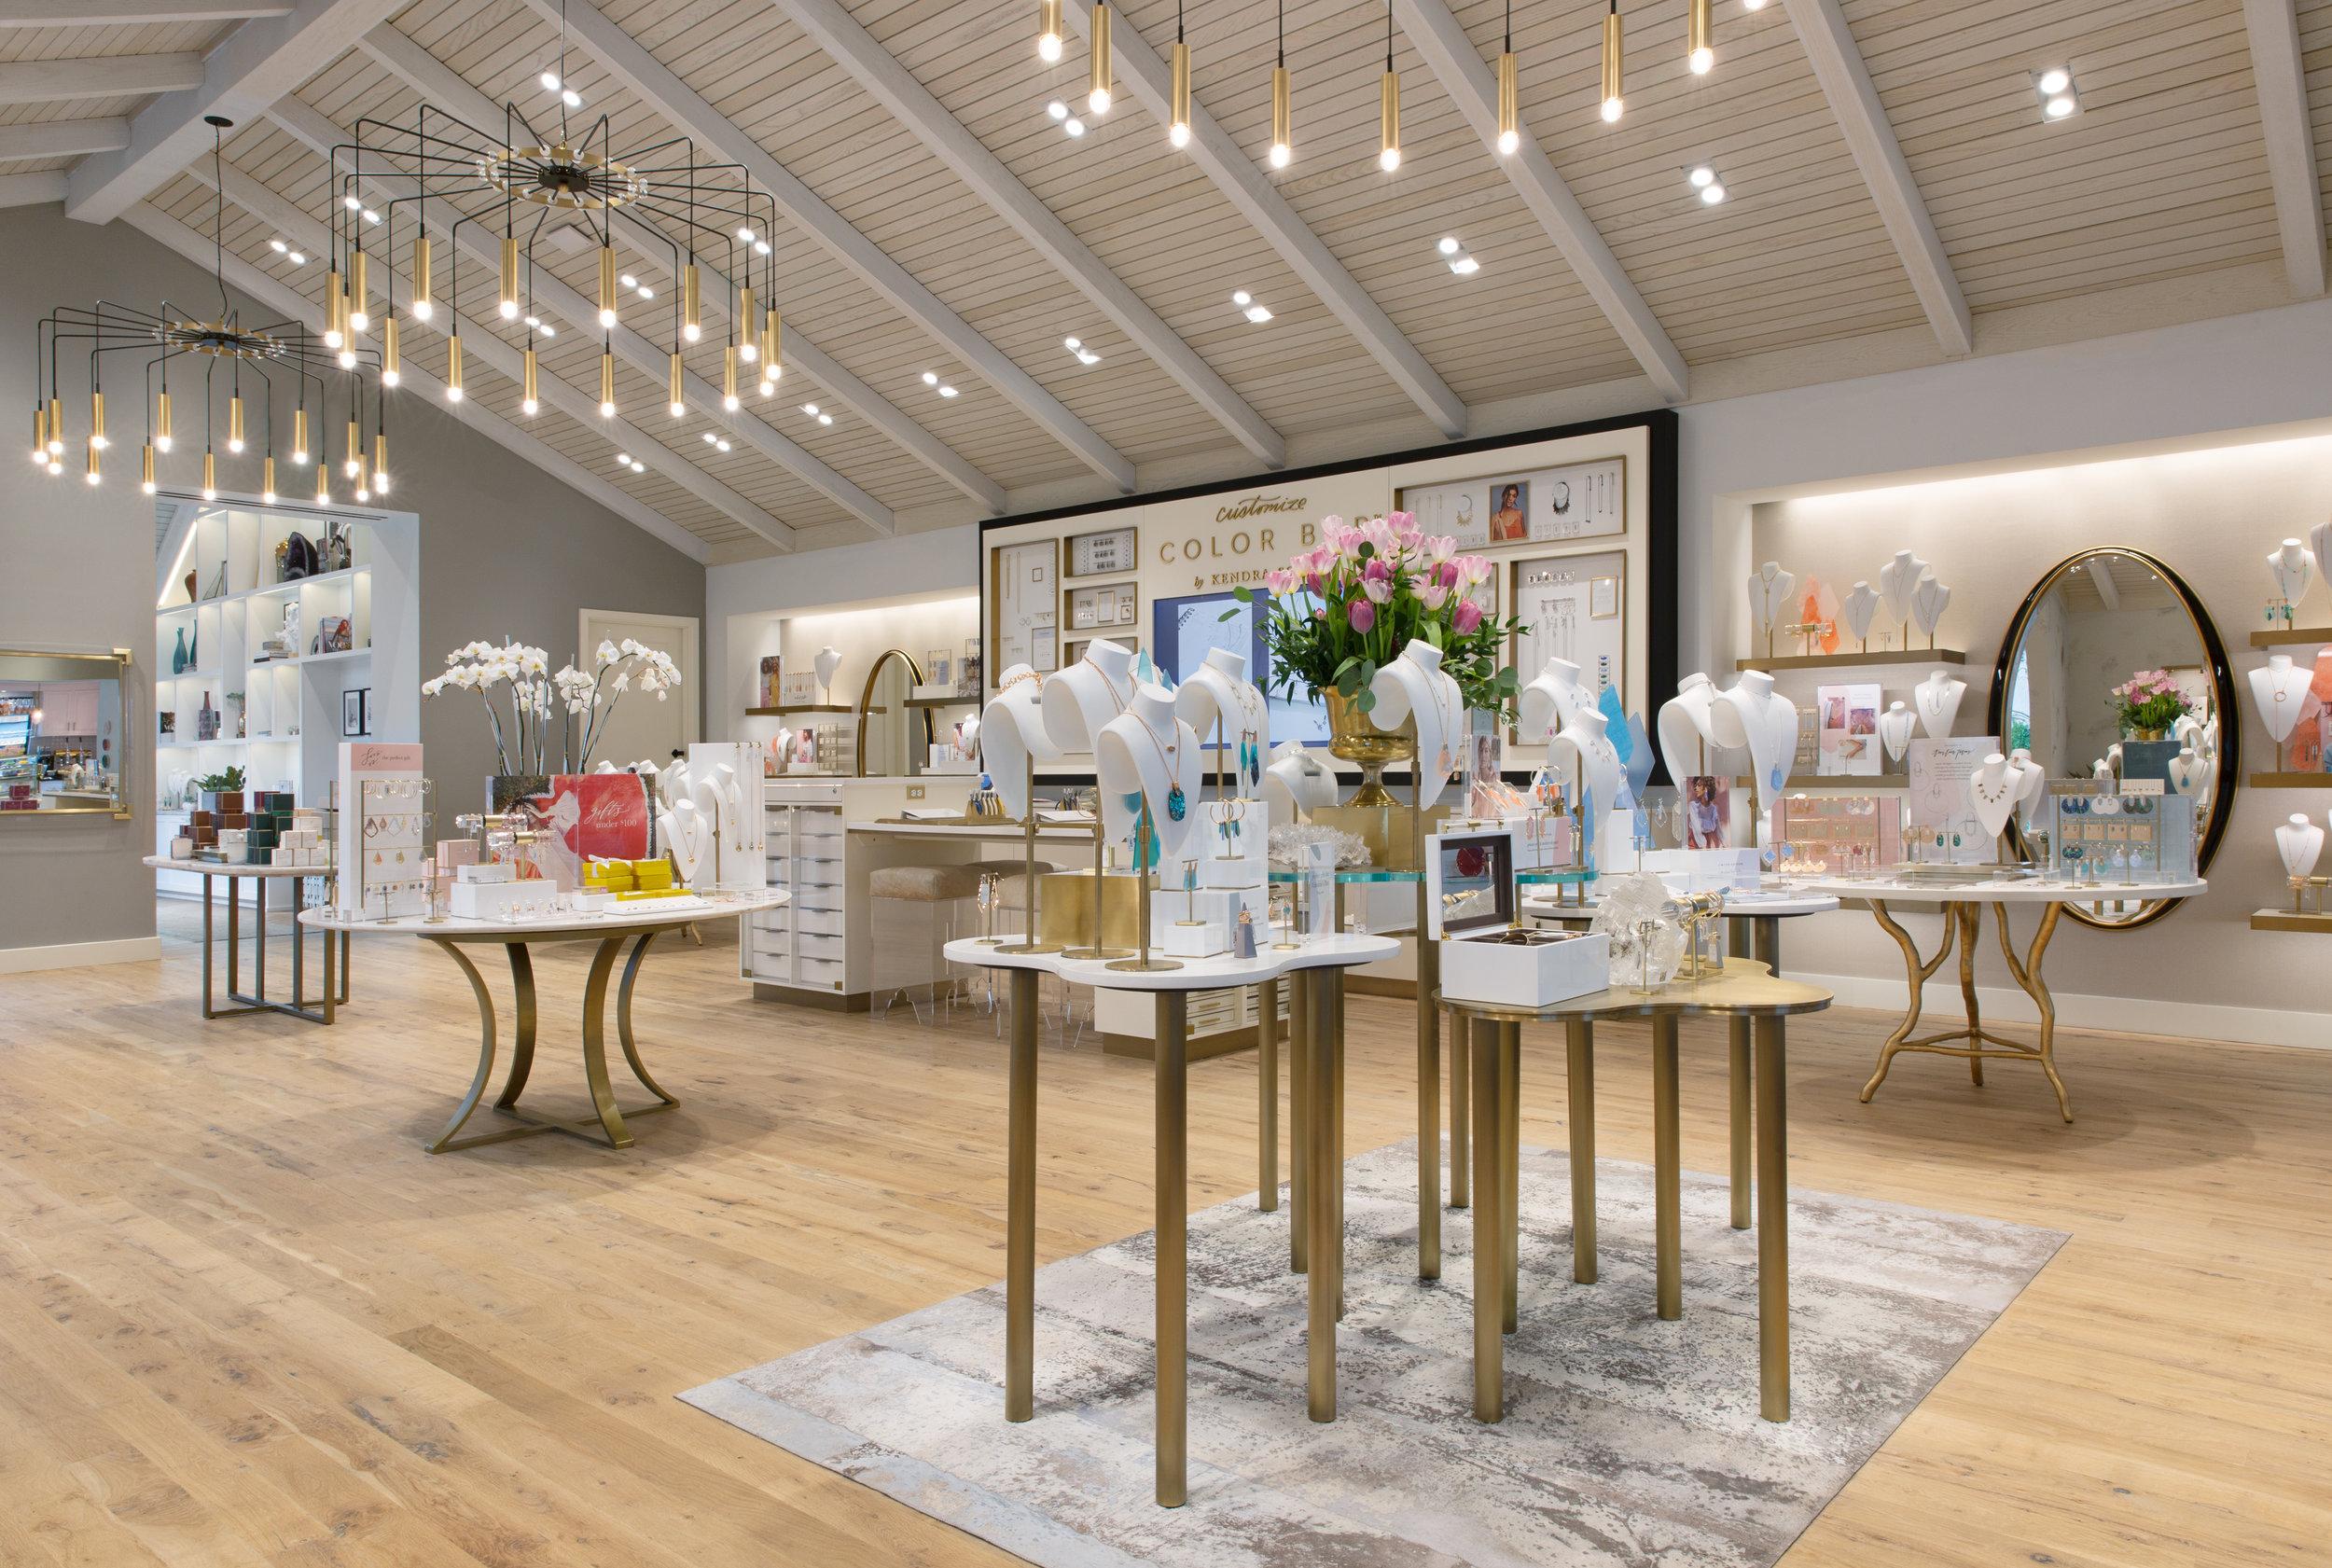 Kendra Scott Flagship Retail Store